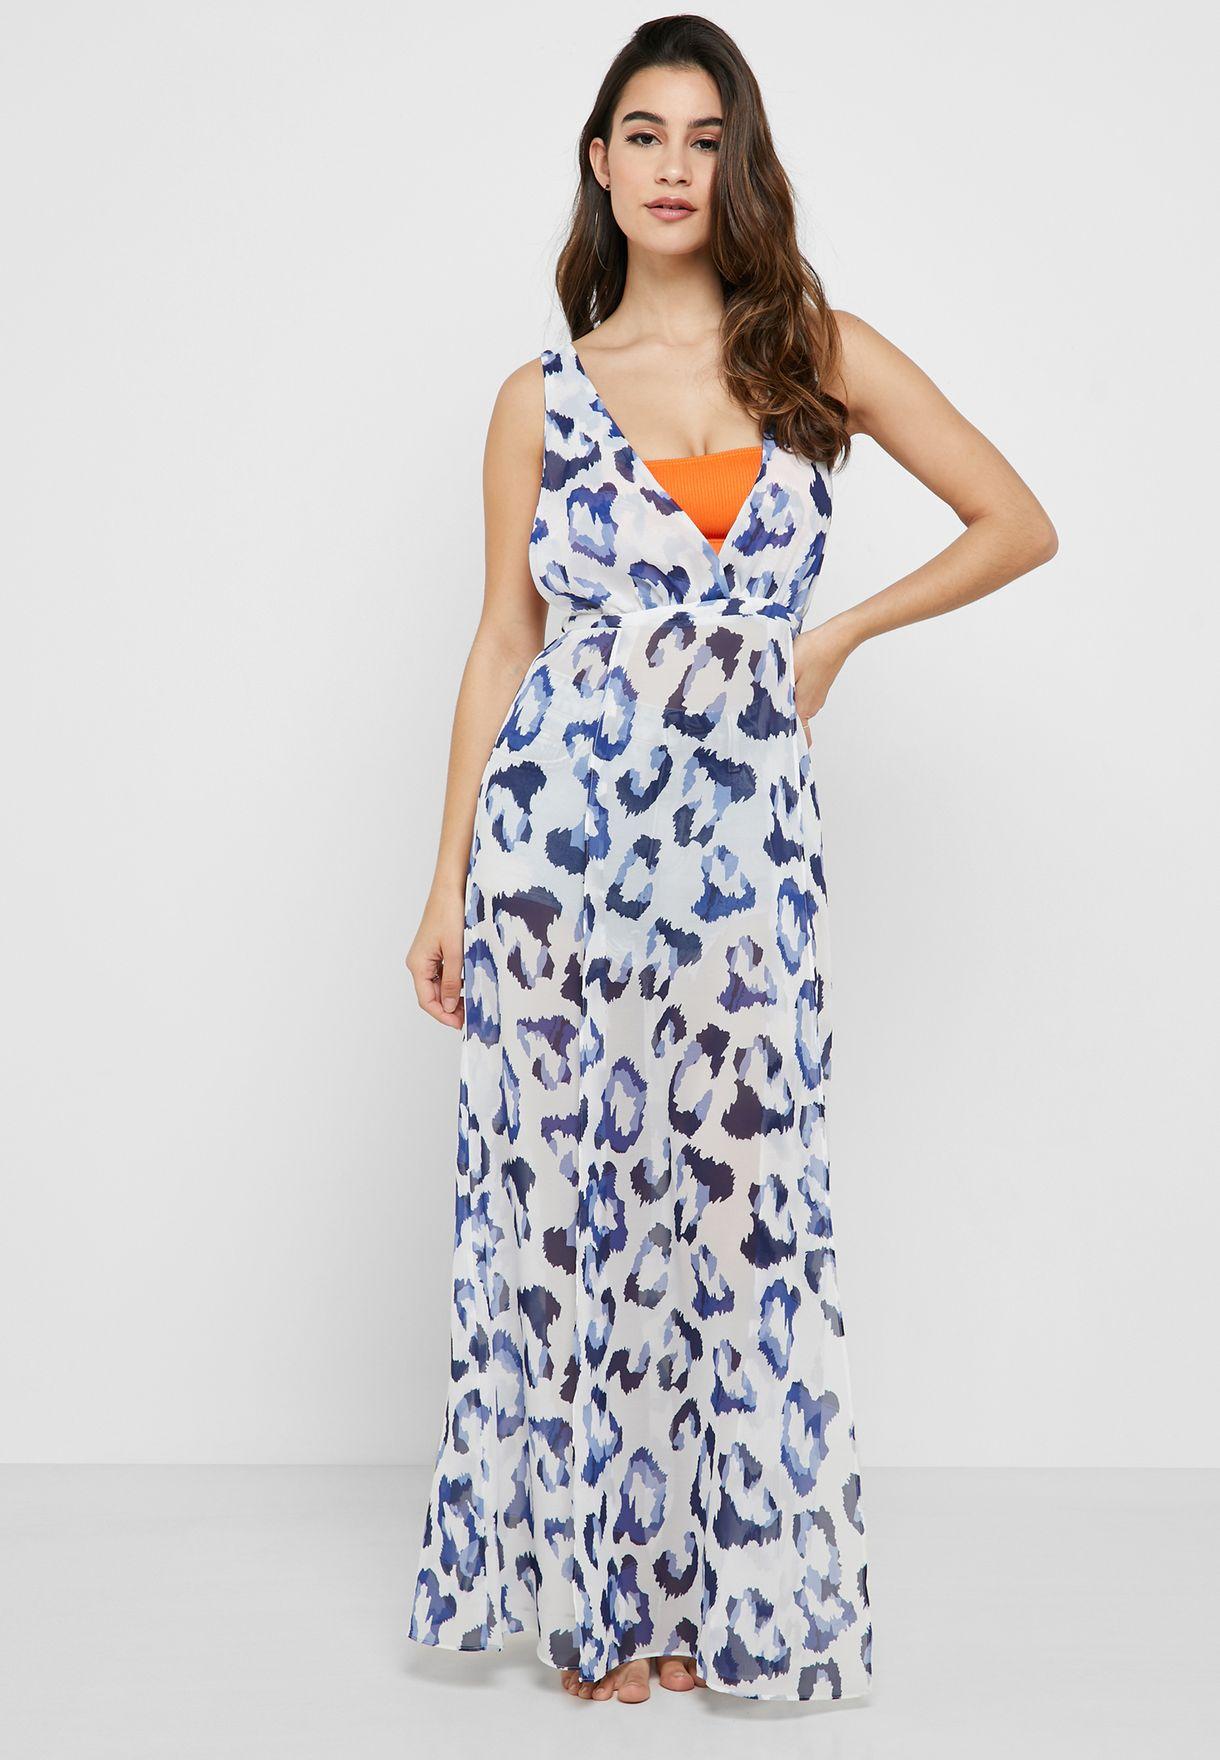 Leopard Print Front Slit Beach Dress